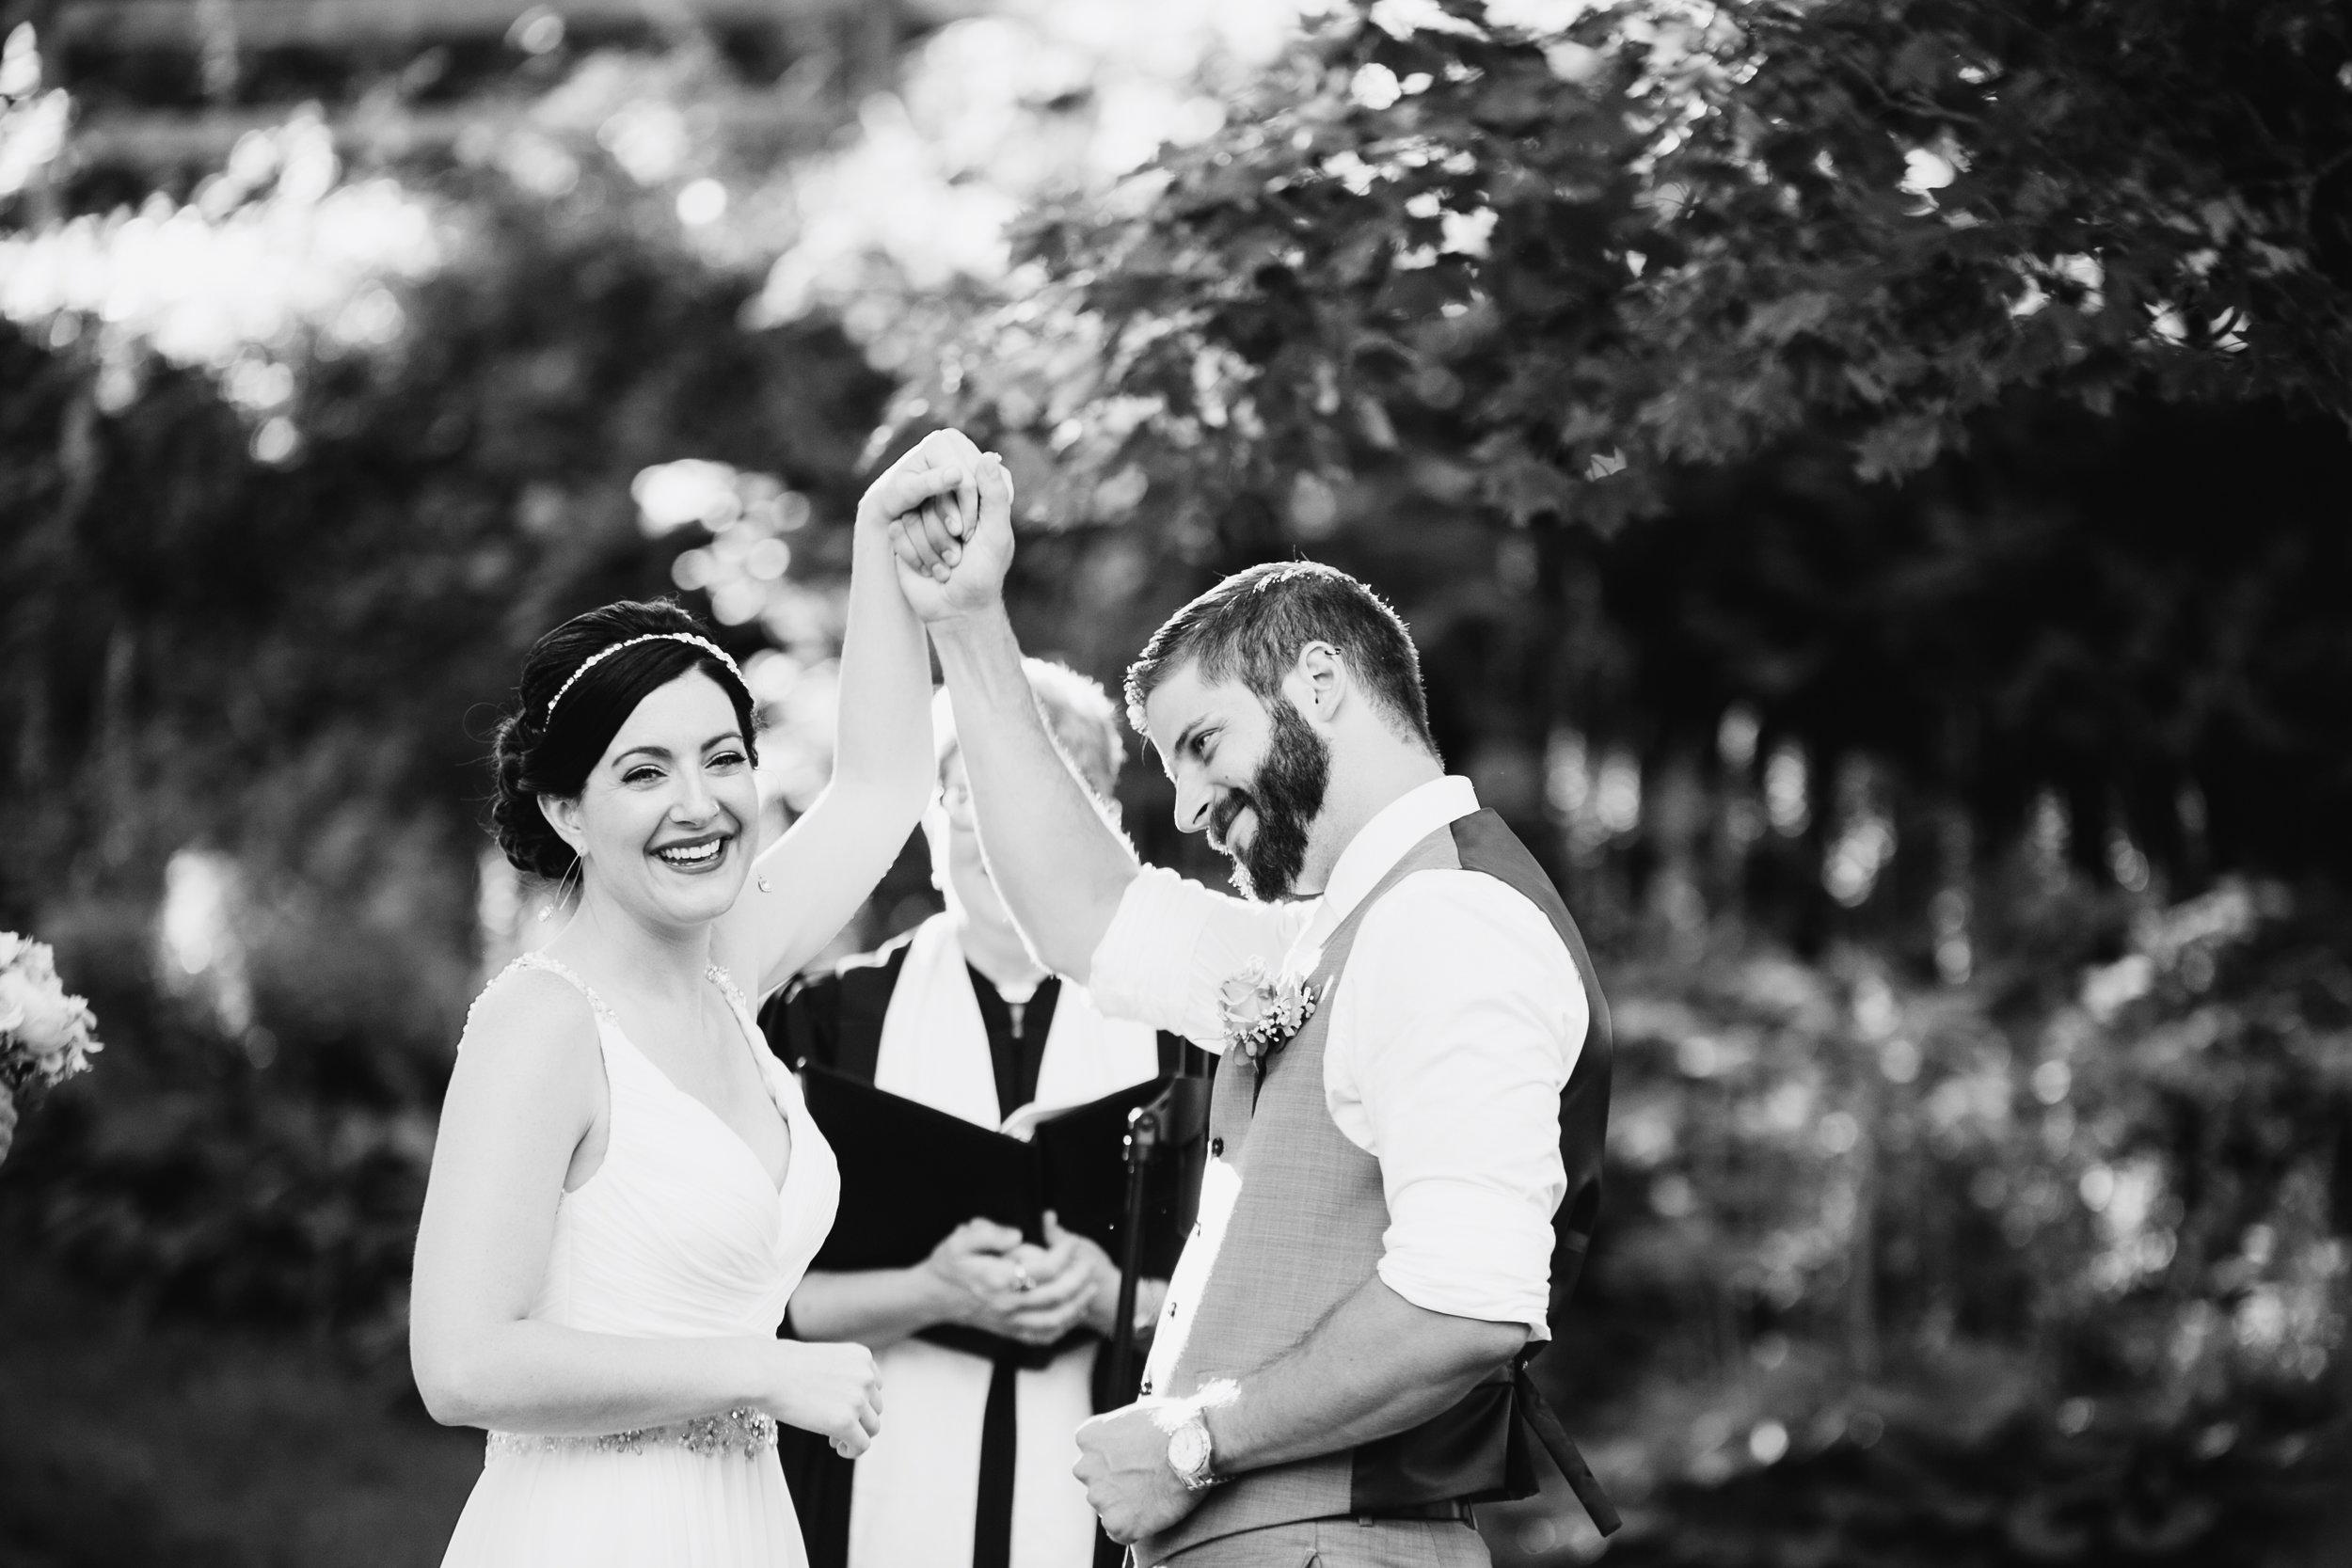 TYLER ARBORETUM WEDDING PHOTOGRAPHY LOVESTRUCK PICTURES-062.jpg